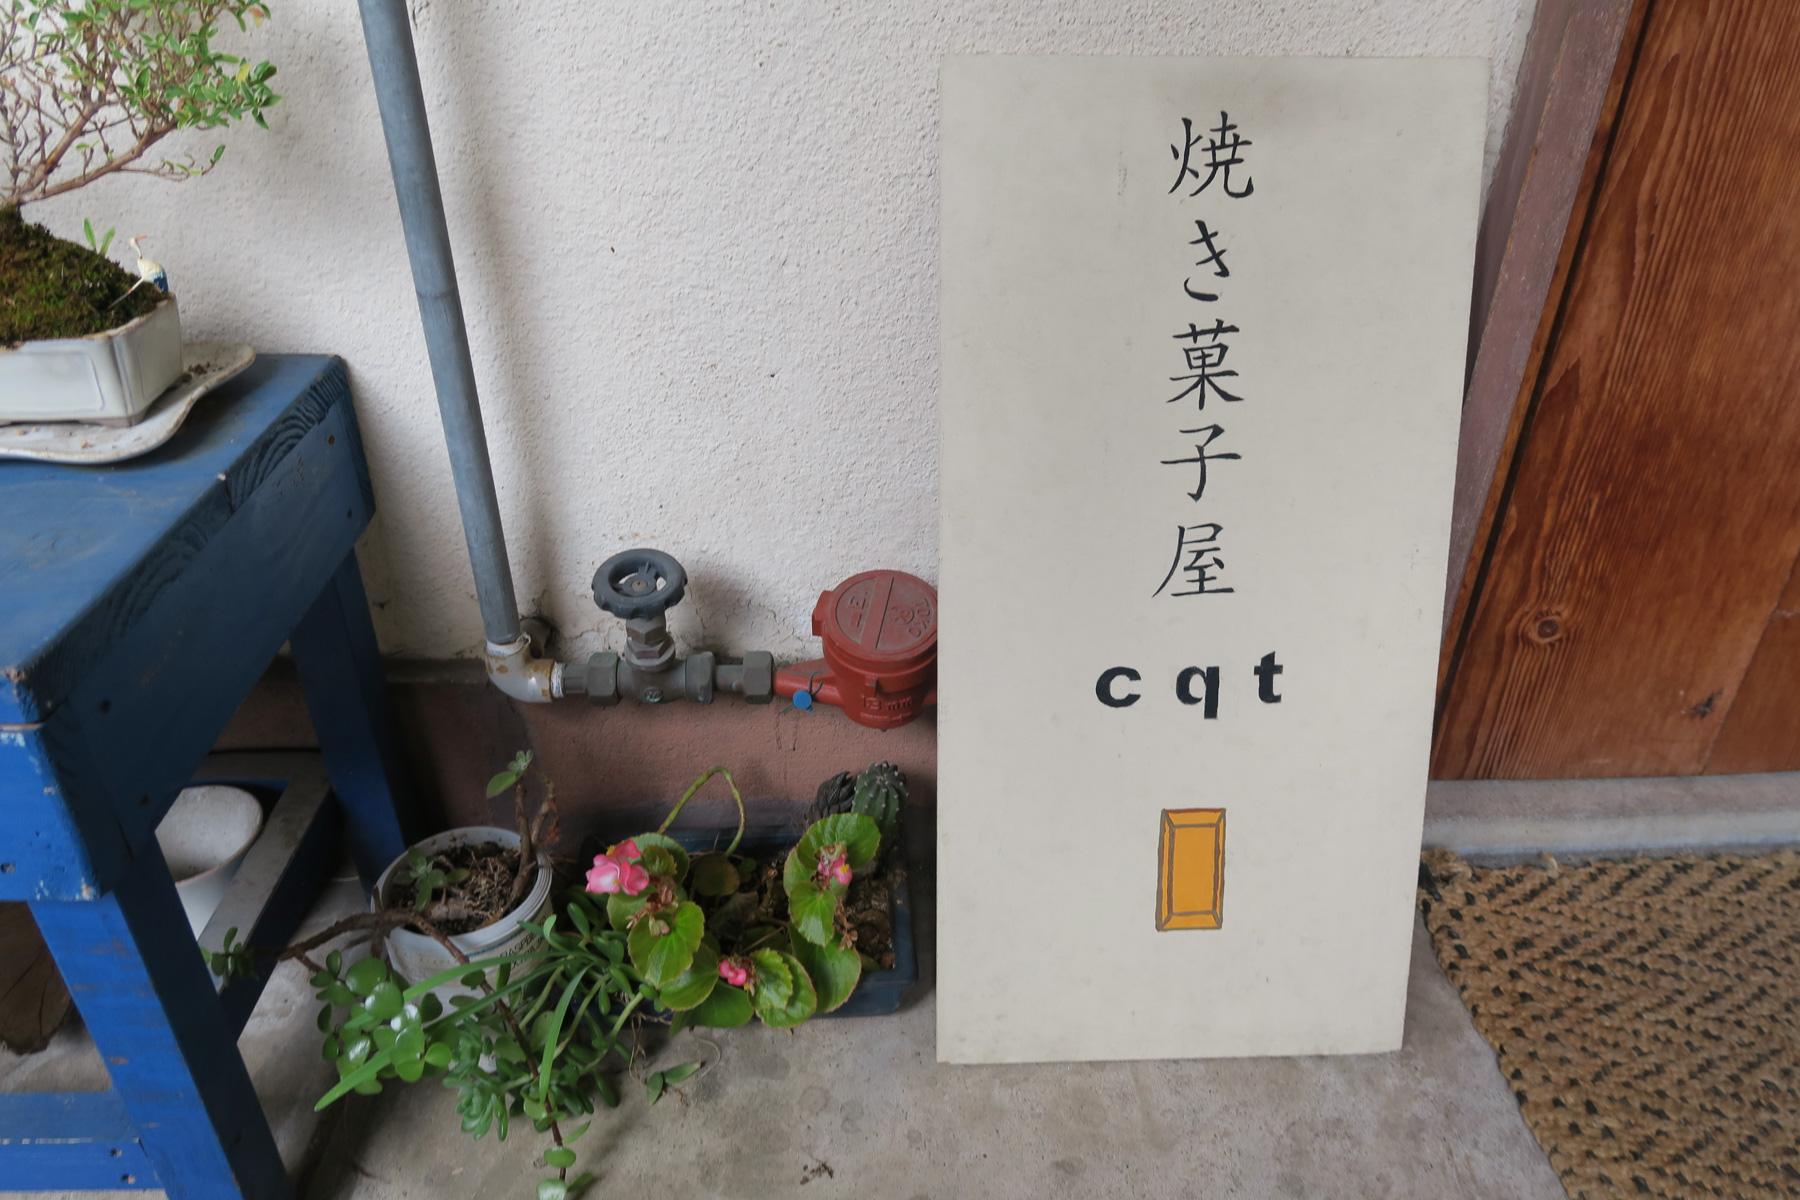 Cafe-CQT-02.jpg